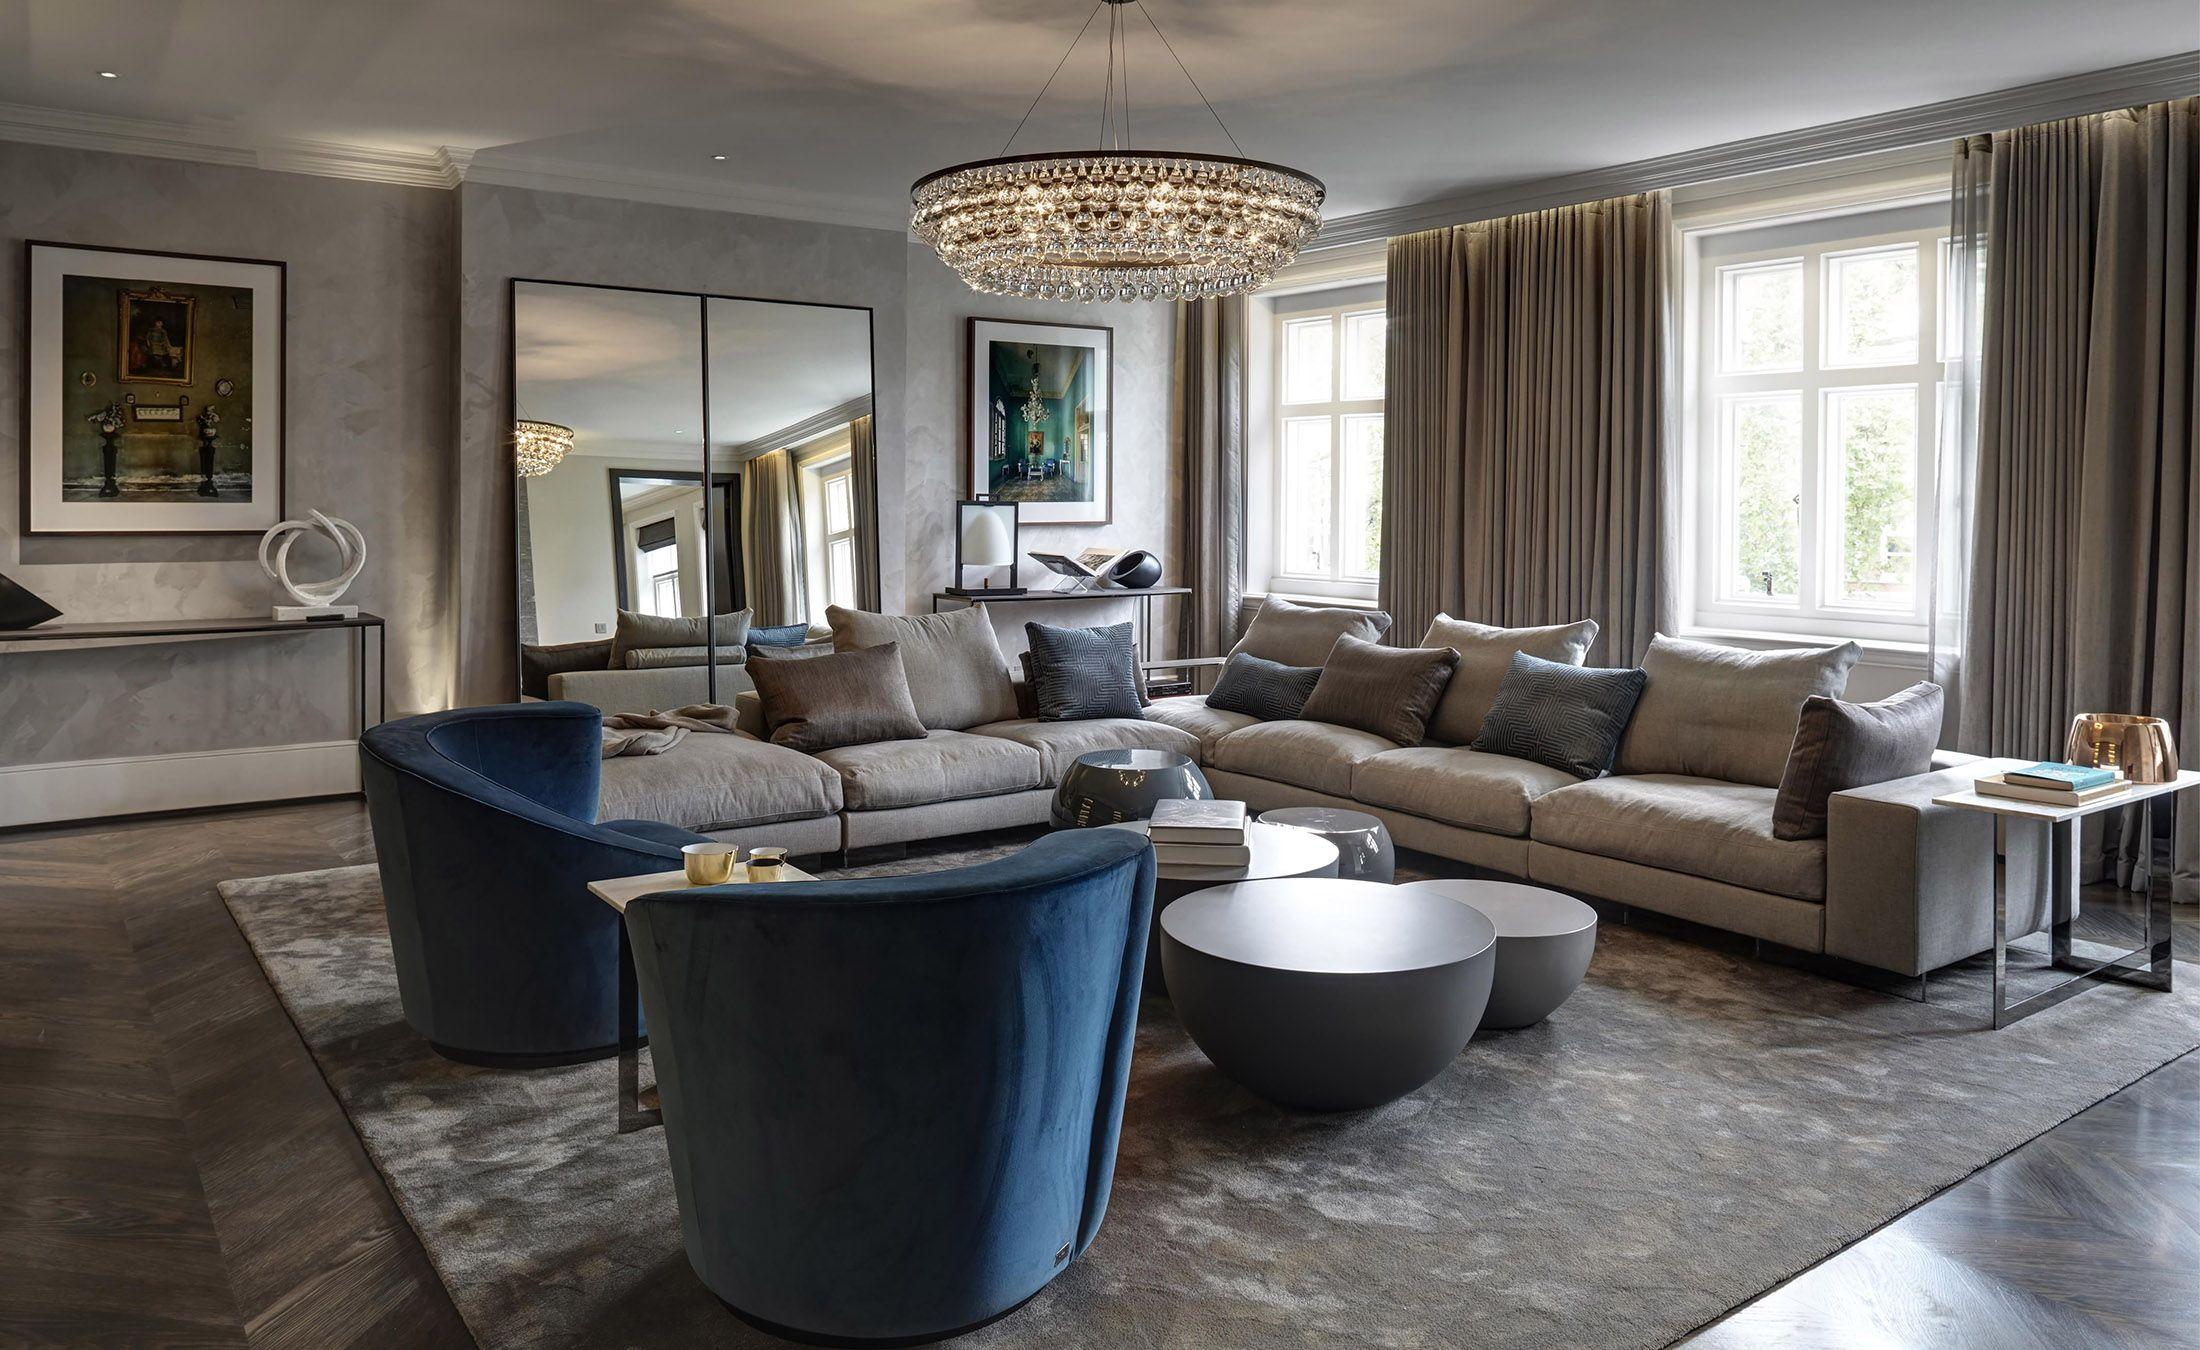 Interior Designed Living Rooms Staffan Tollgard Contemporary Interior Design  Living Room